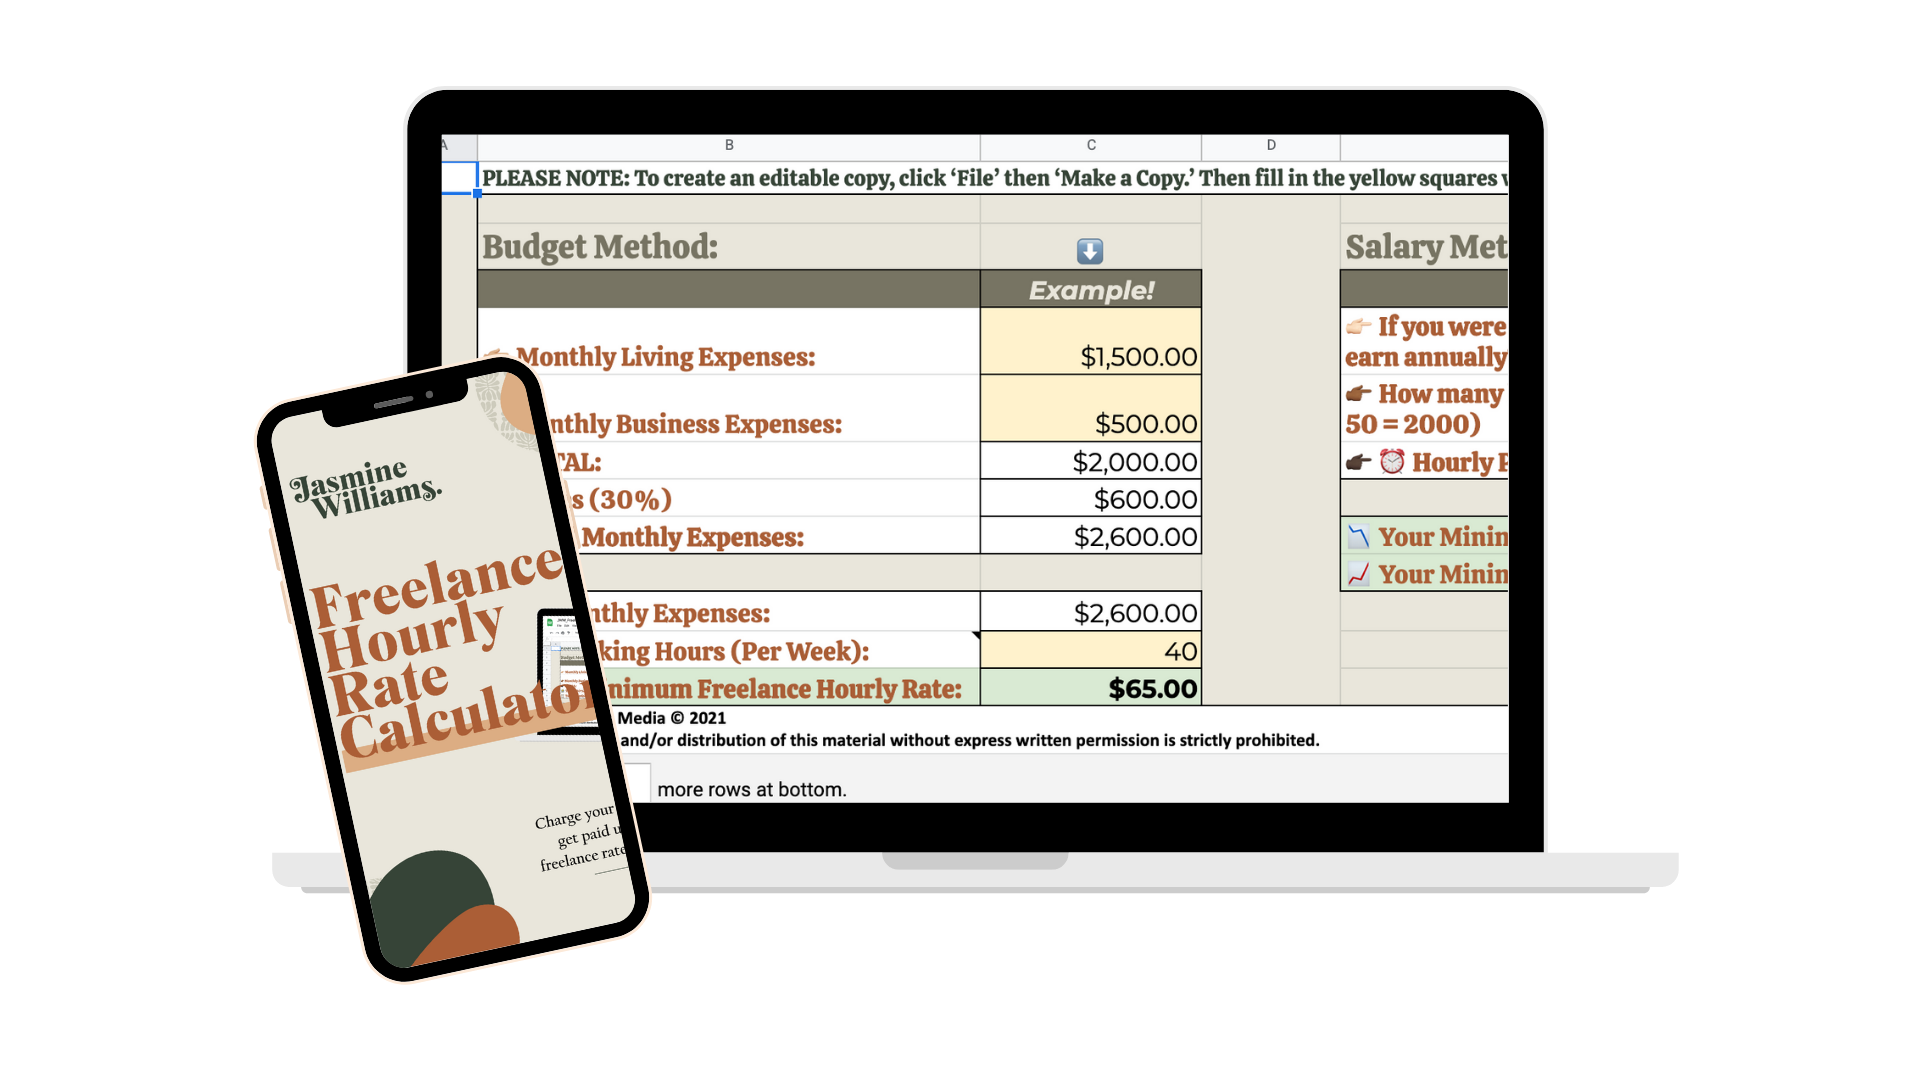 Freelance Rate Calculator Mockup